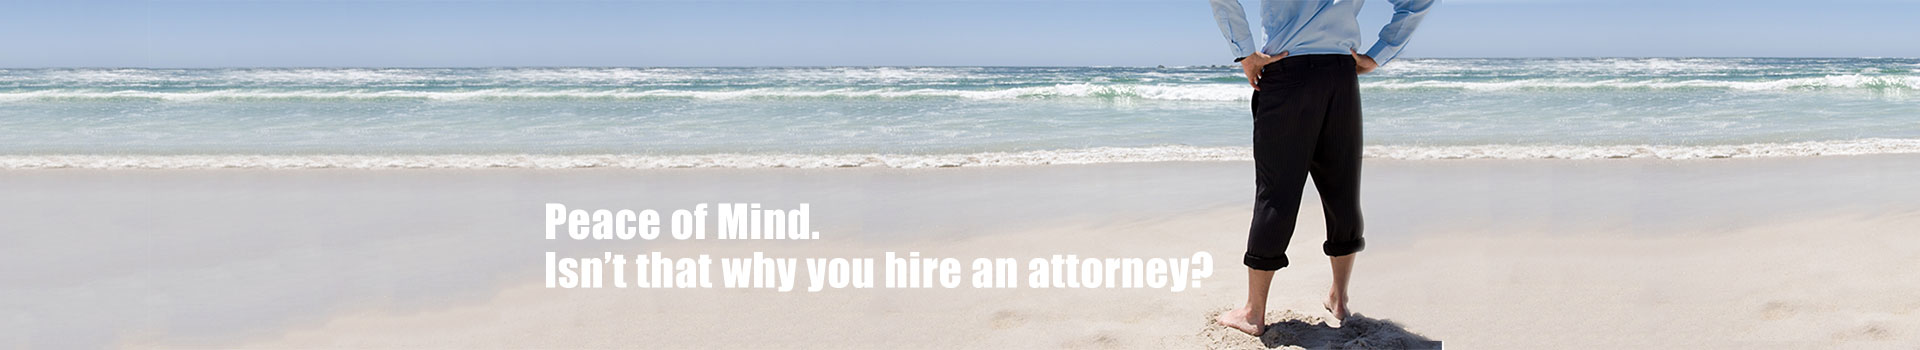 Attorney on beach, Gary L. Davis, Pasco County Attorney